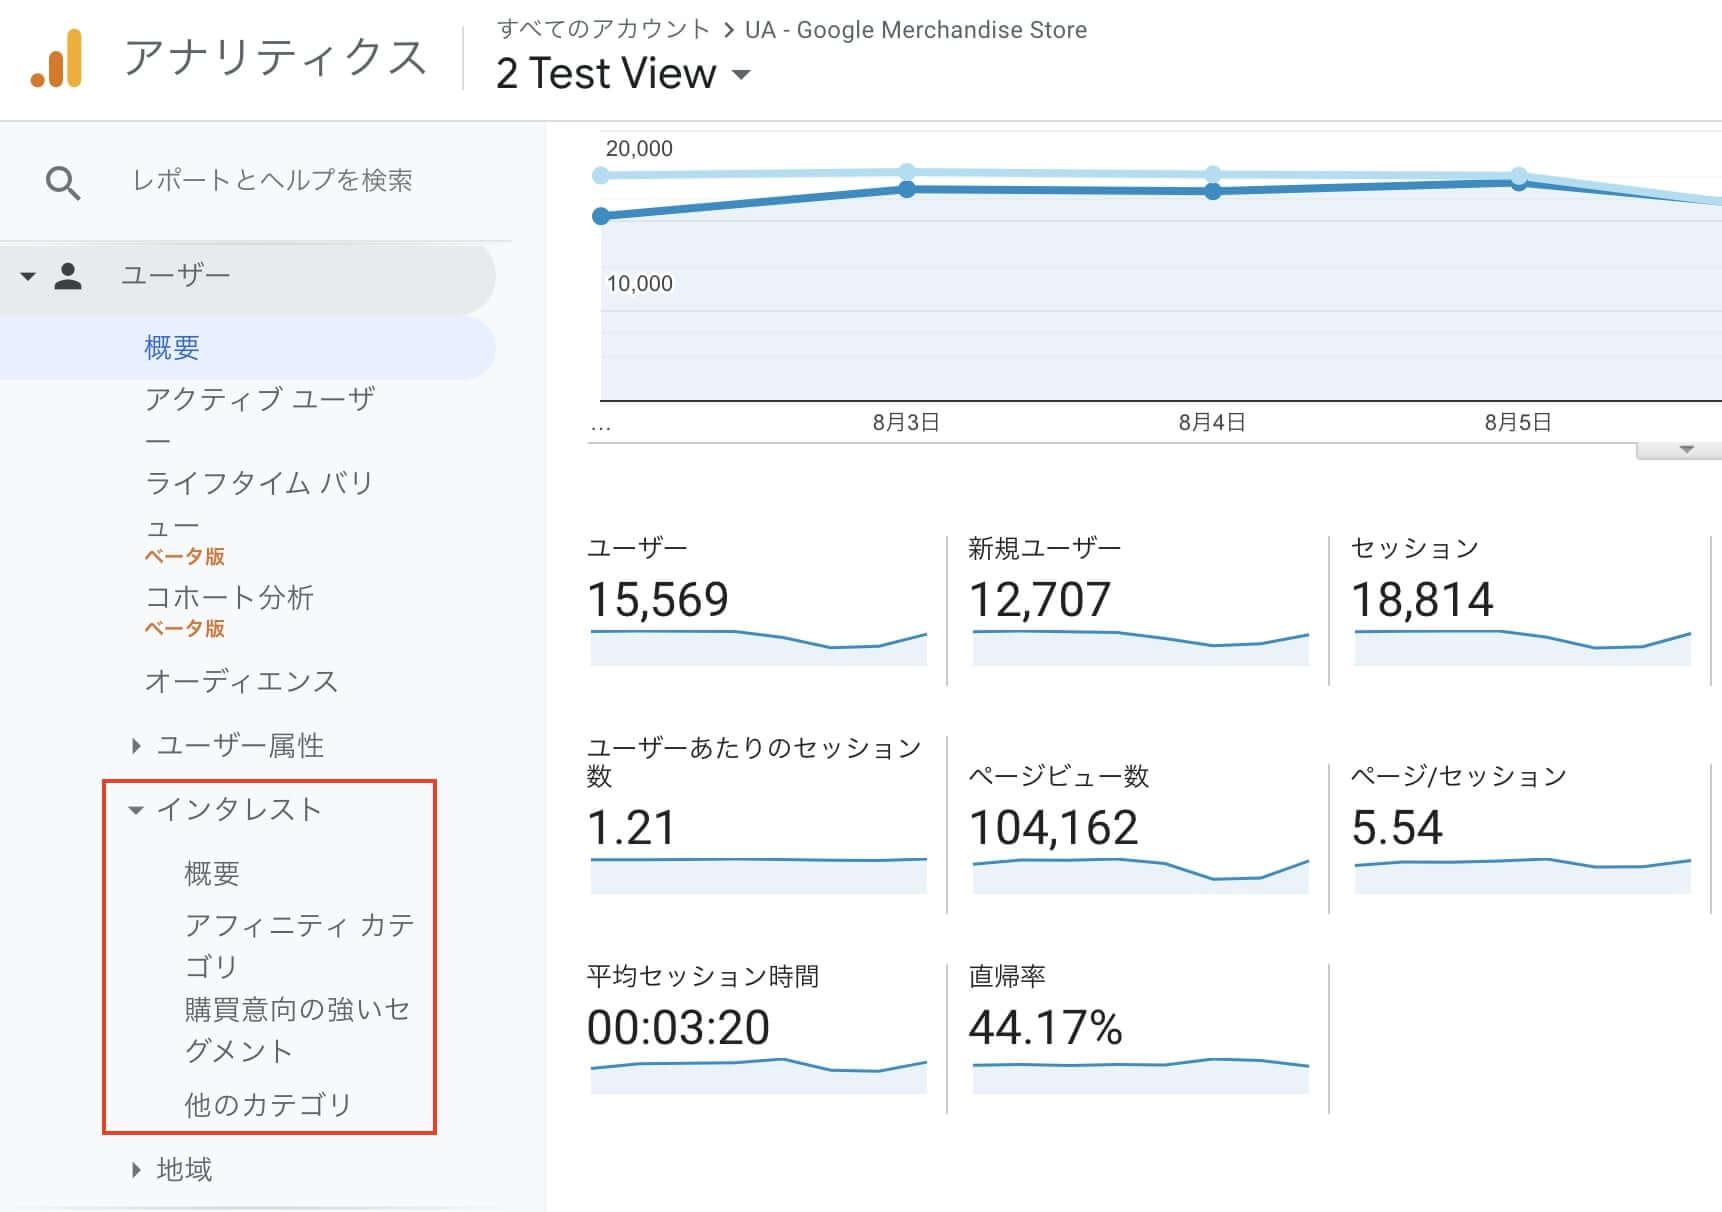 Googleアナリティクスのユーザーのインタレスト(興味関心)表示方法